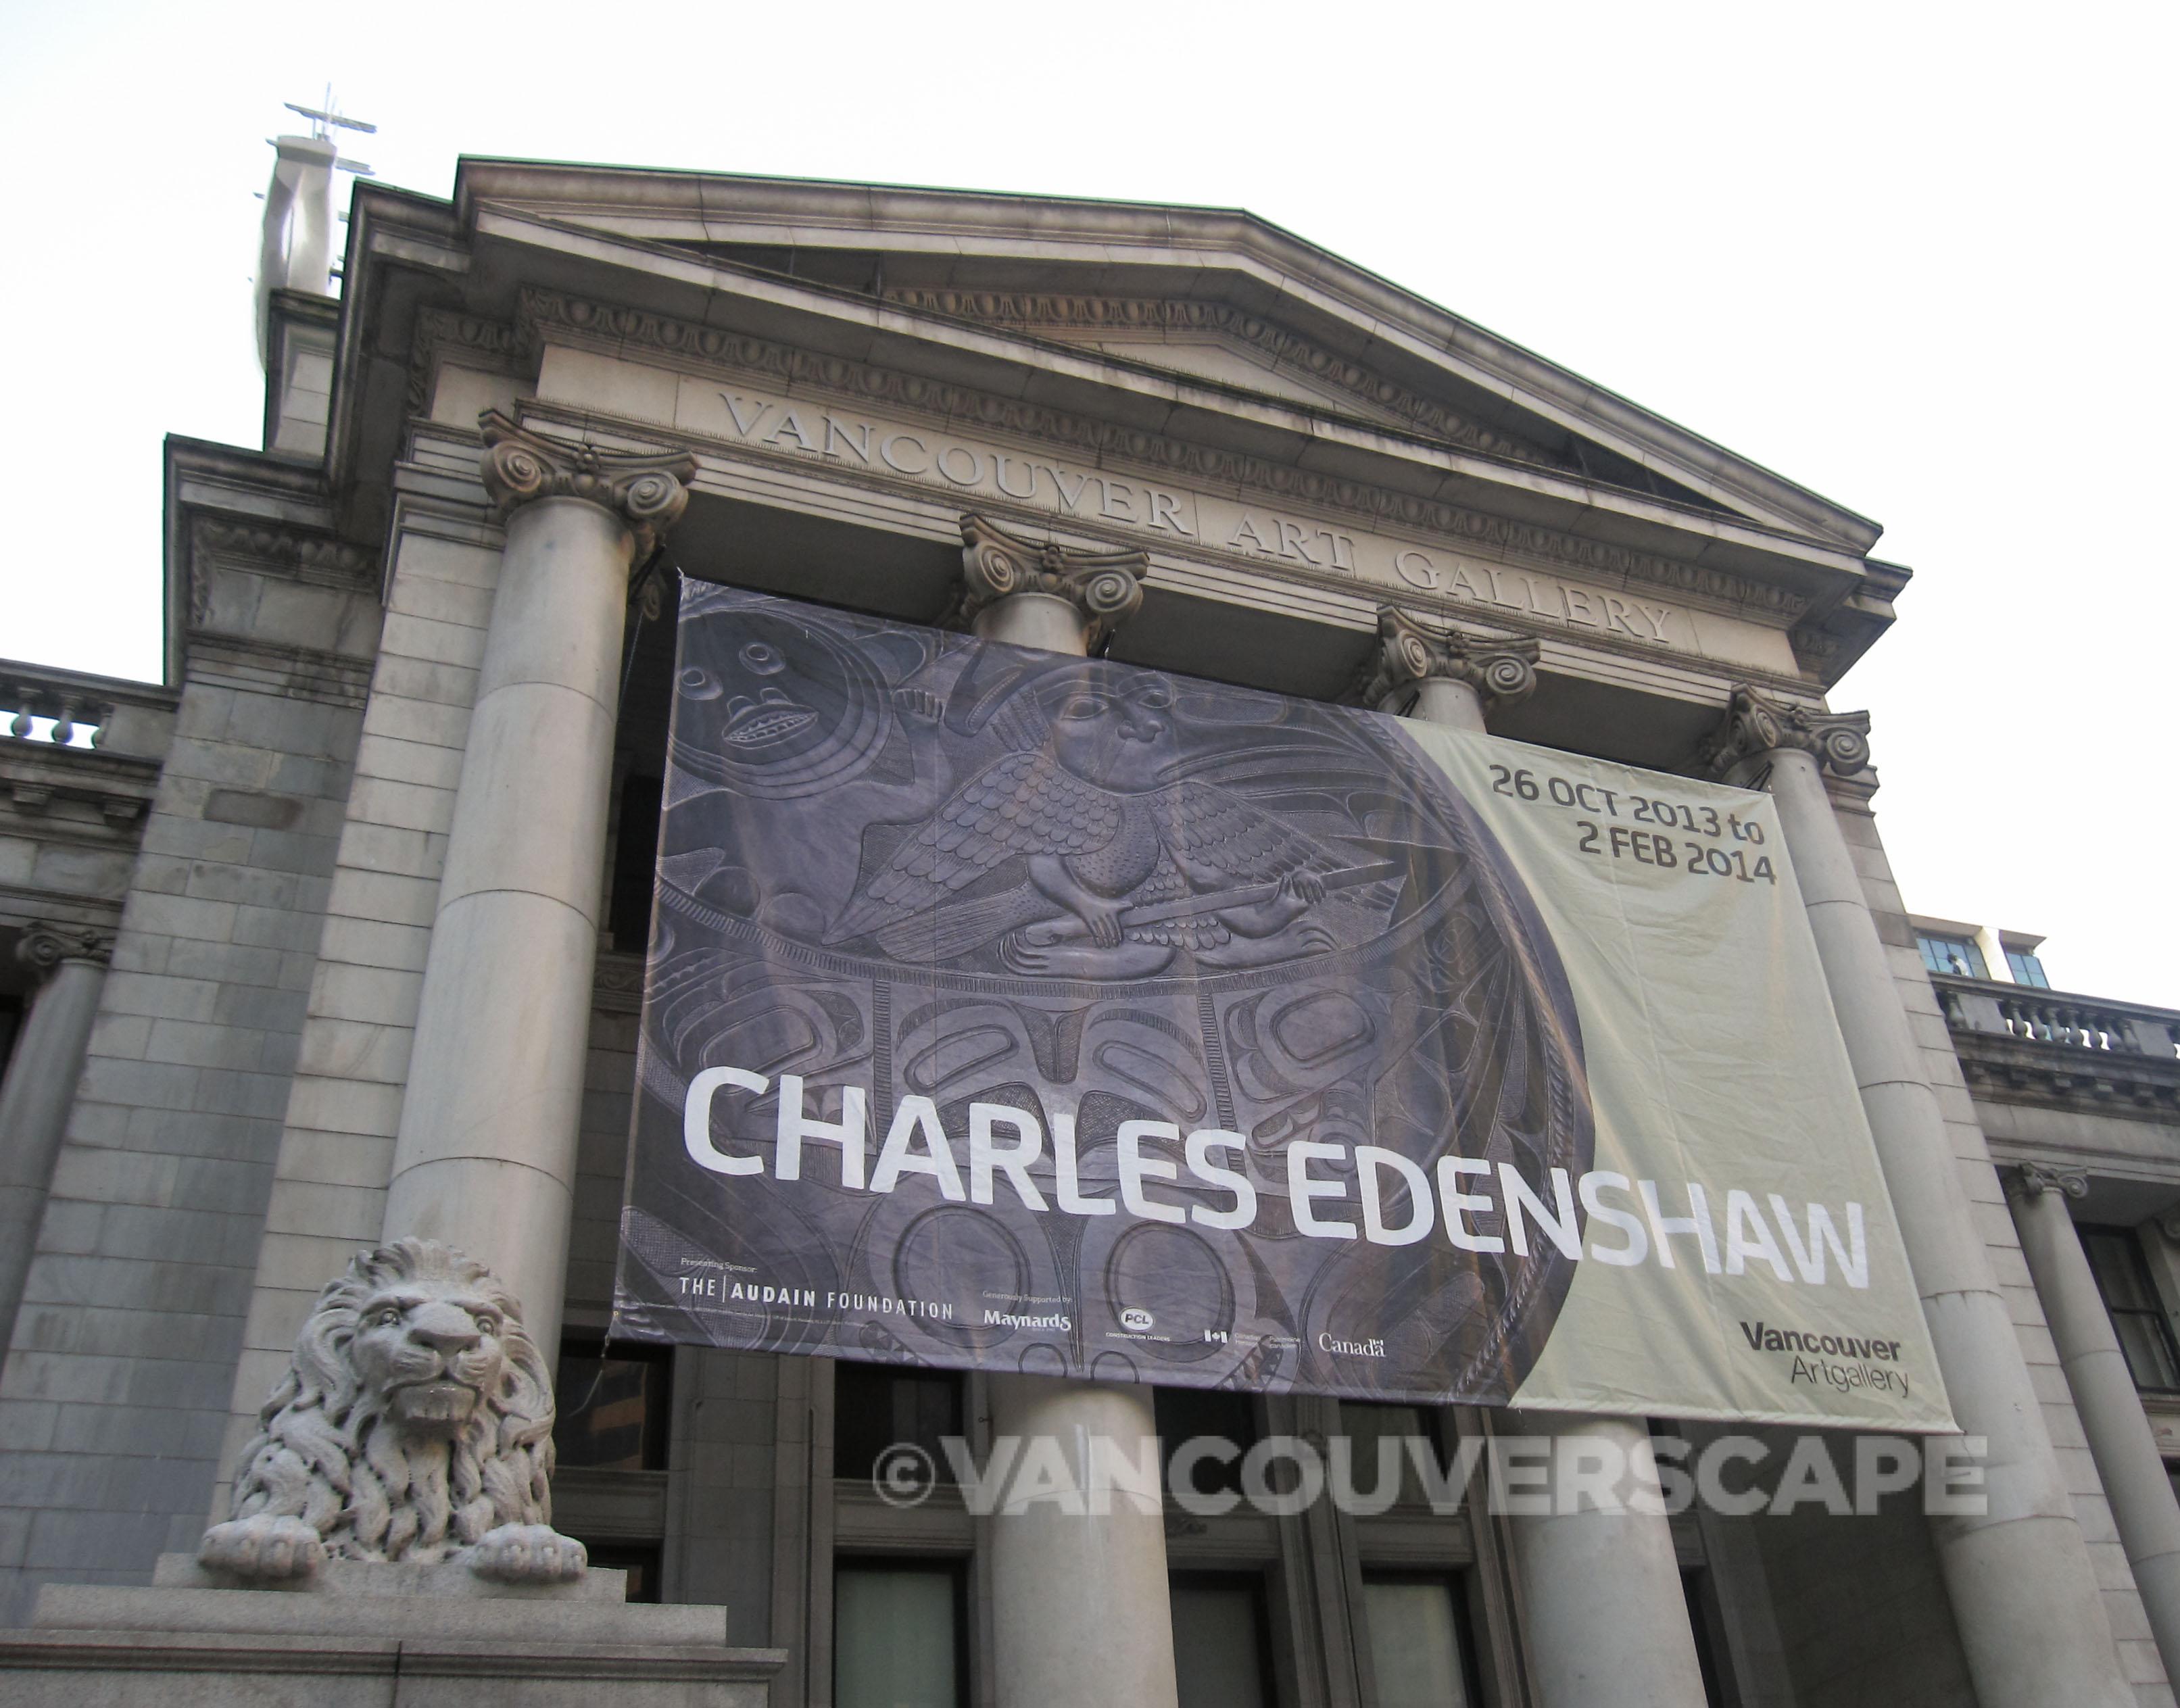 Charles Edenshaw signage